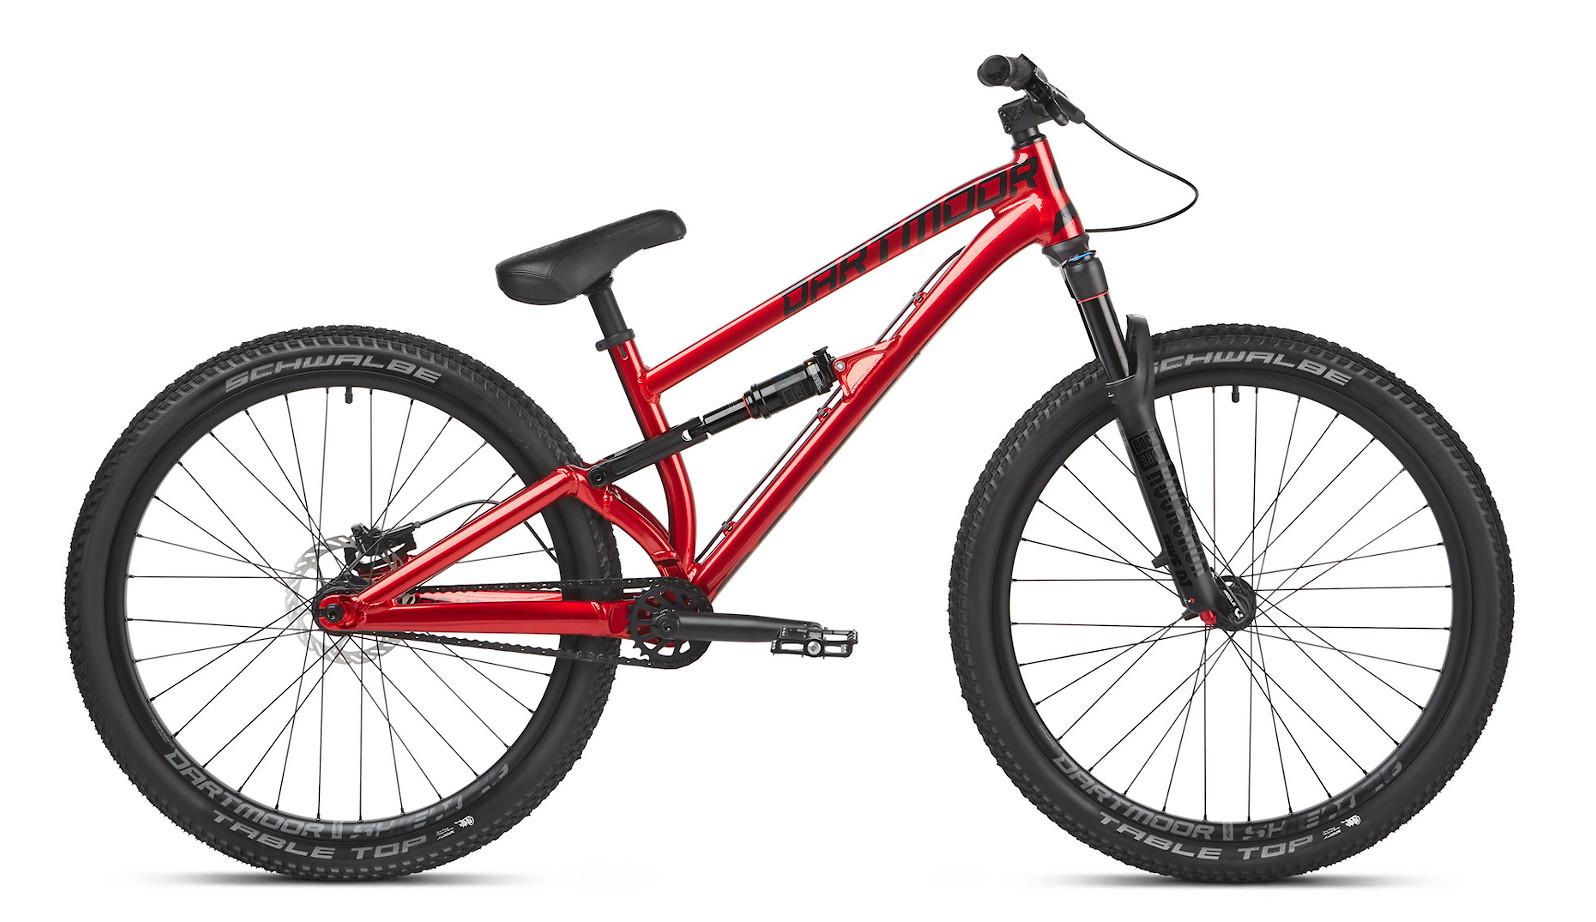 2019 Dartmoor Shine Bike